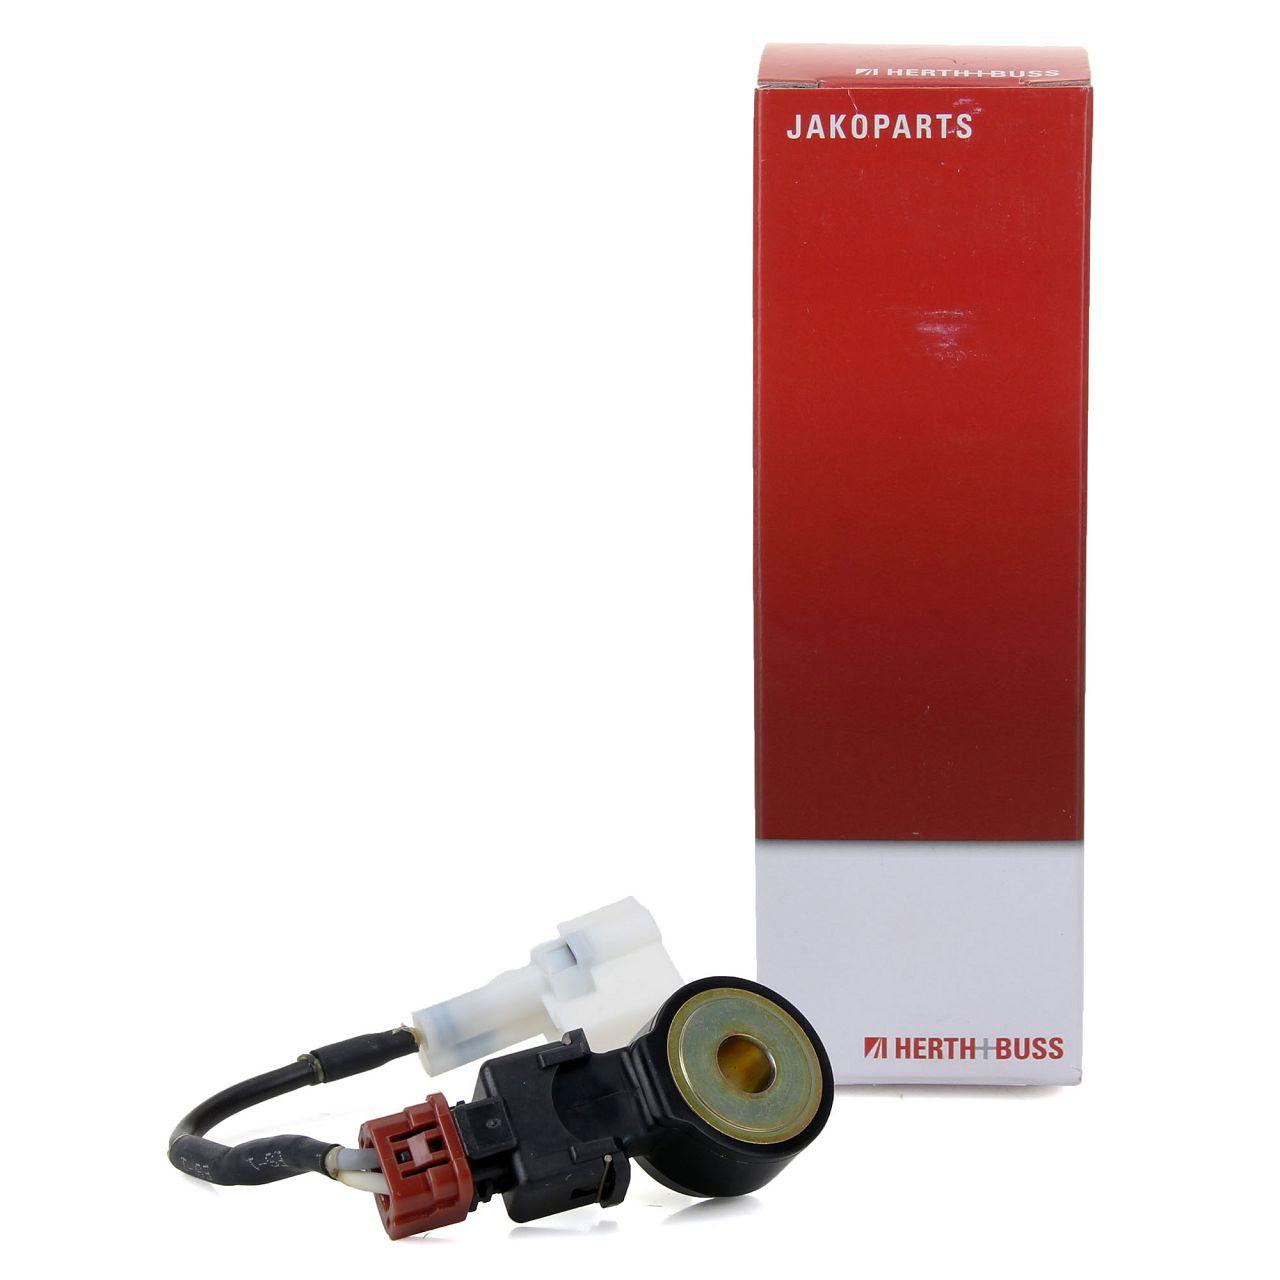 HERTH+BUSS JAKOPARTS Klopfsensor Motorklopfsensor Sensor Motorklopfen J5677000